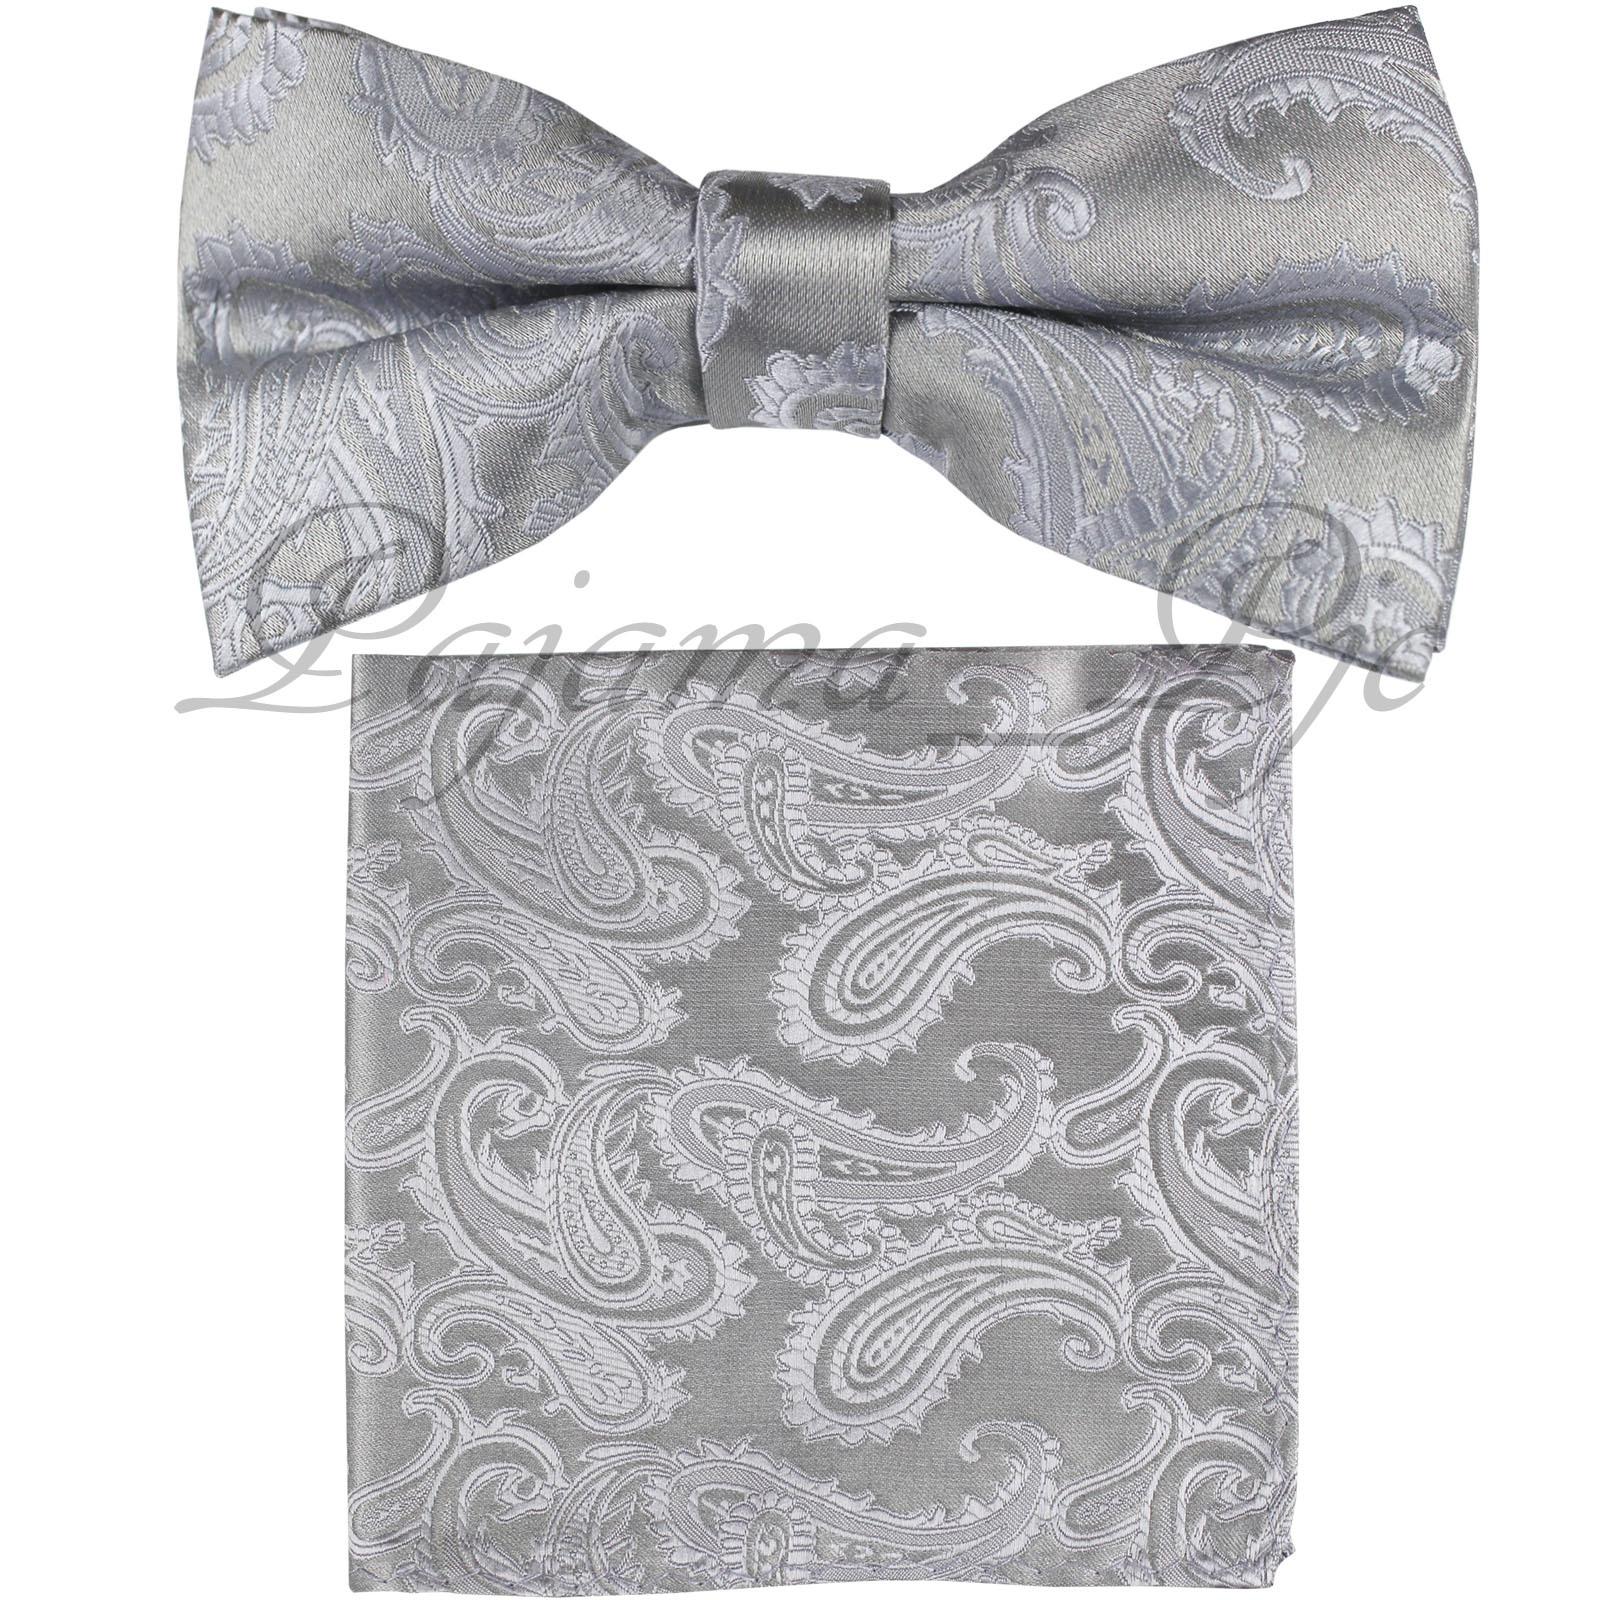 New Men/'s Polyester pocket square hankie only dark grey prom wedding